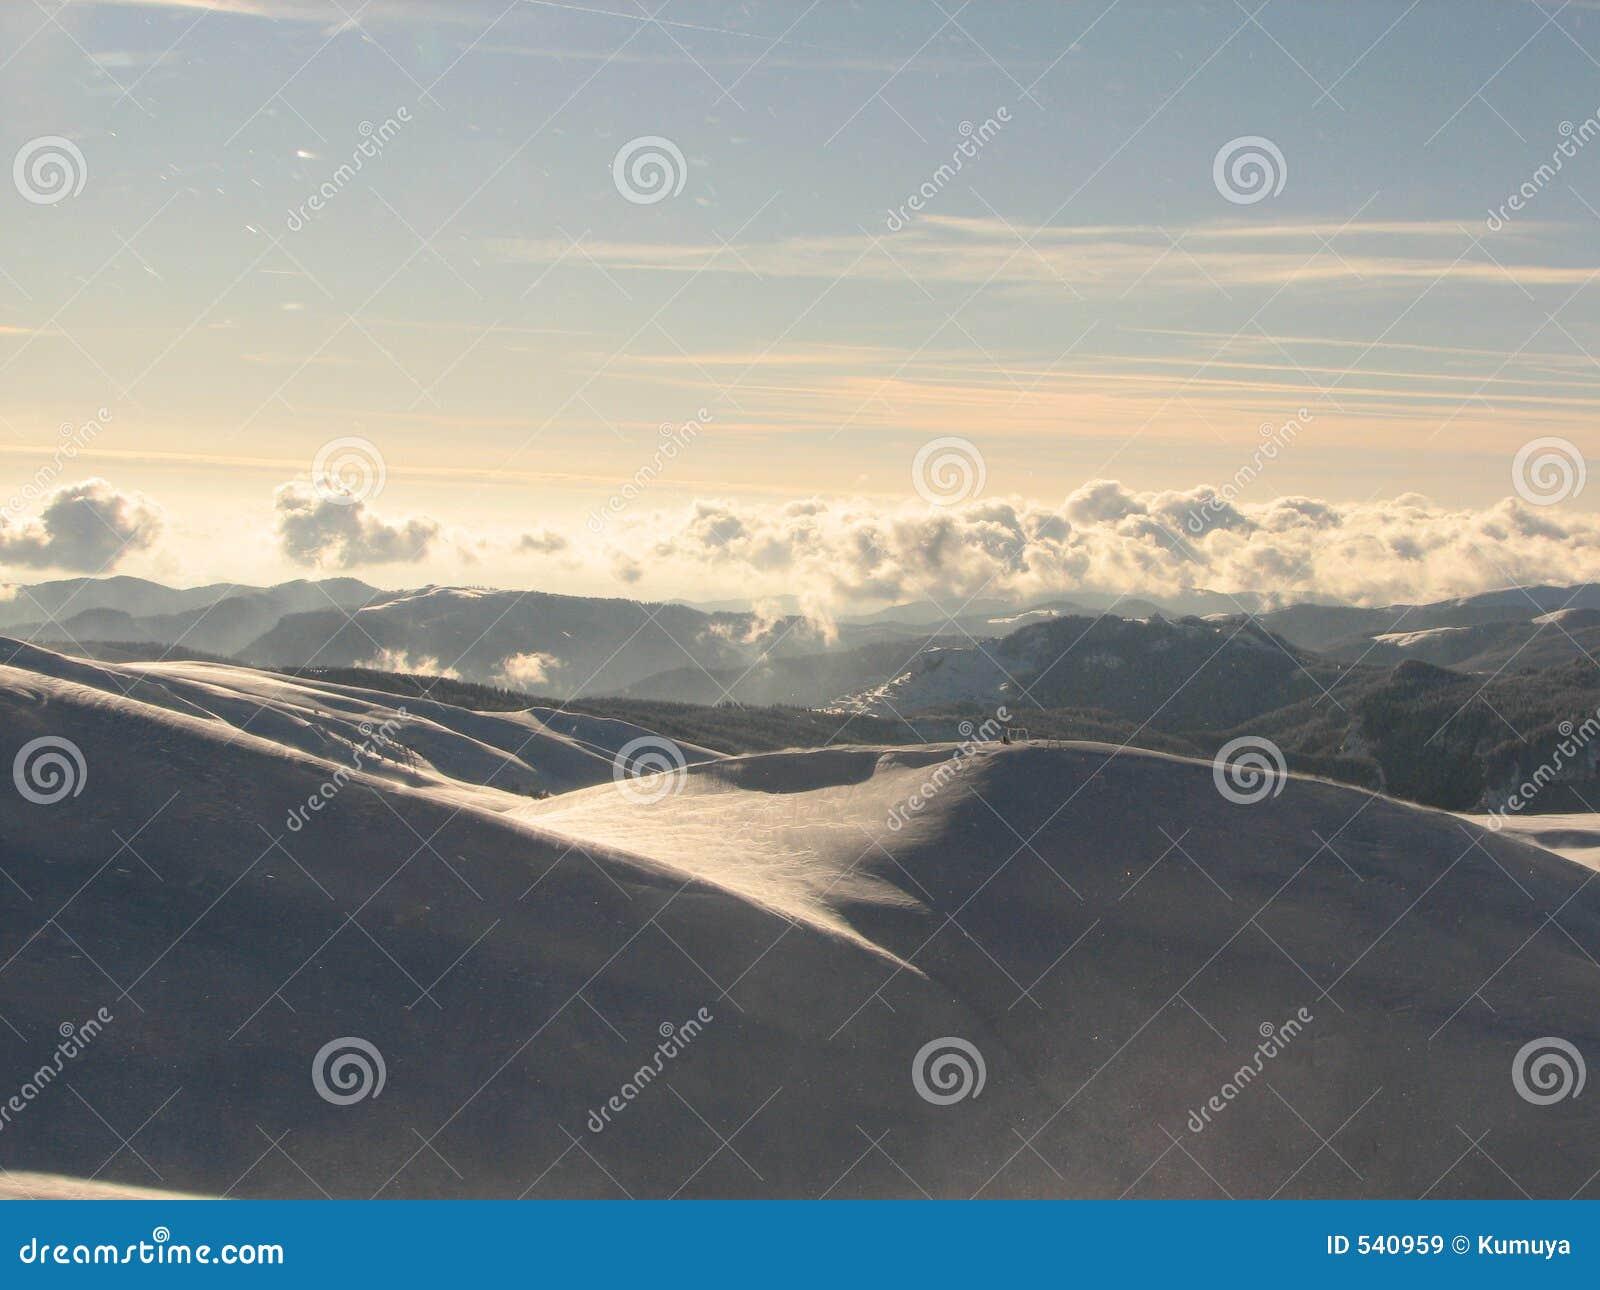 Download 地面更高 库存图片. 图片 包括有 云彩, 横向, 天空, 日落, 冬天, 组塑, 高度 - 540959